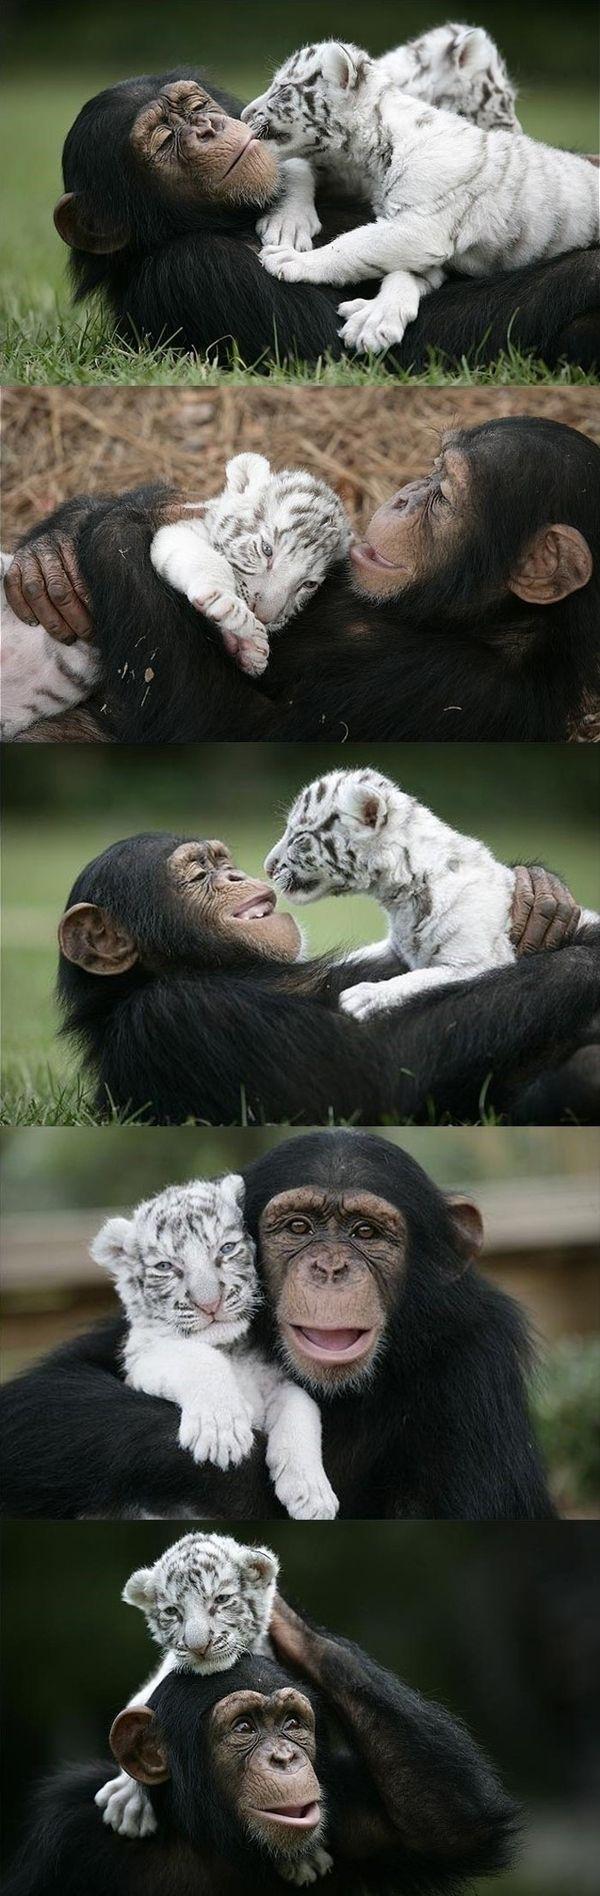 Chimpanzee and Tiger Cub